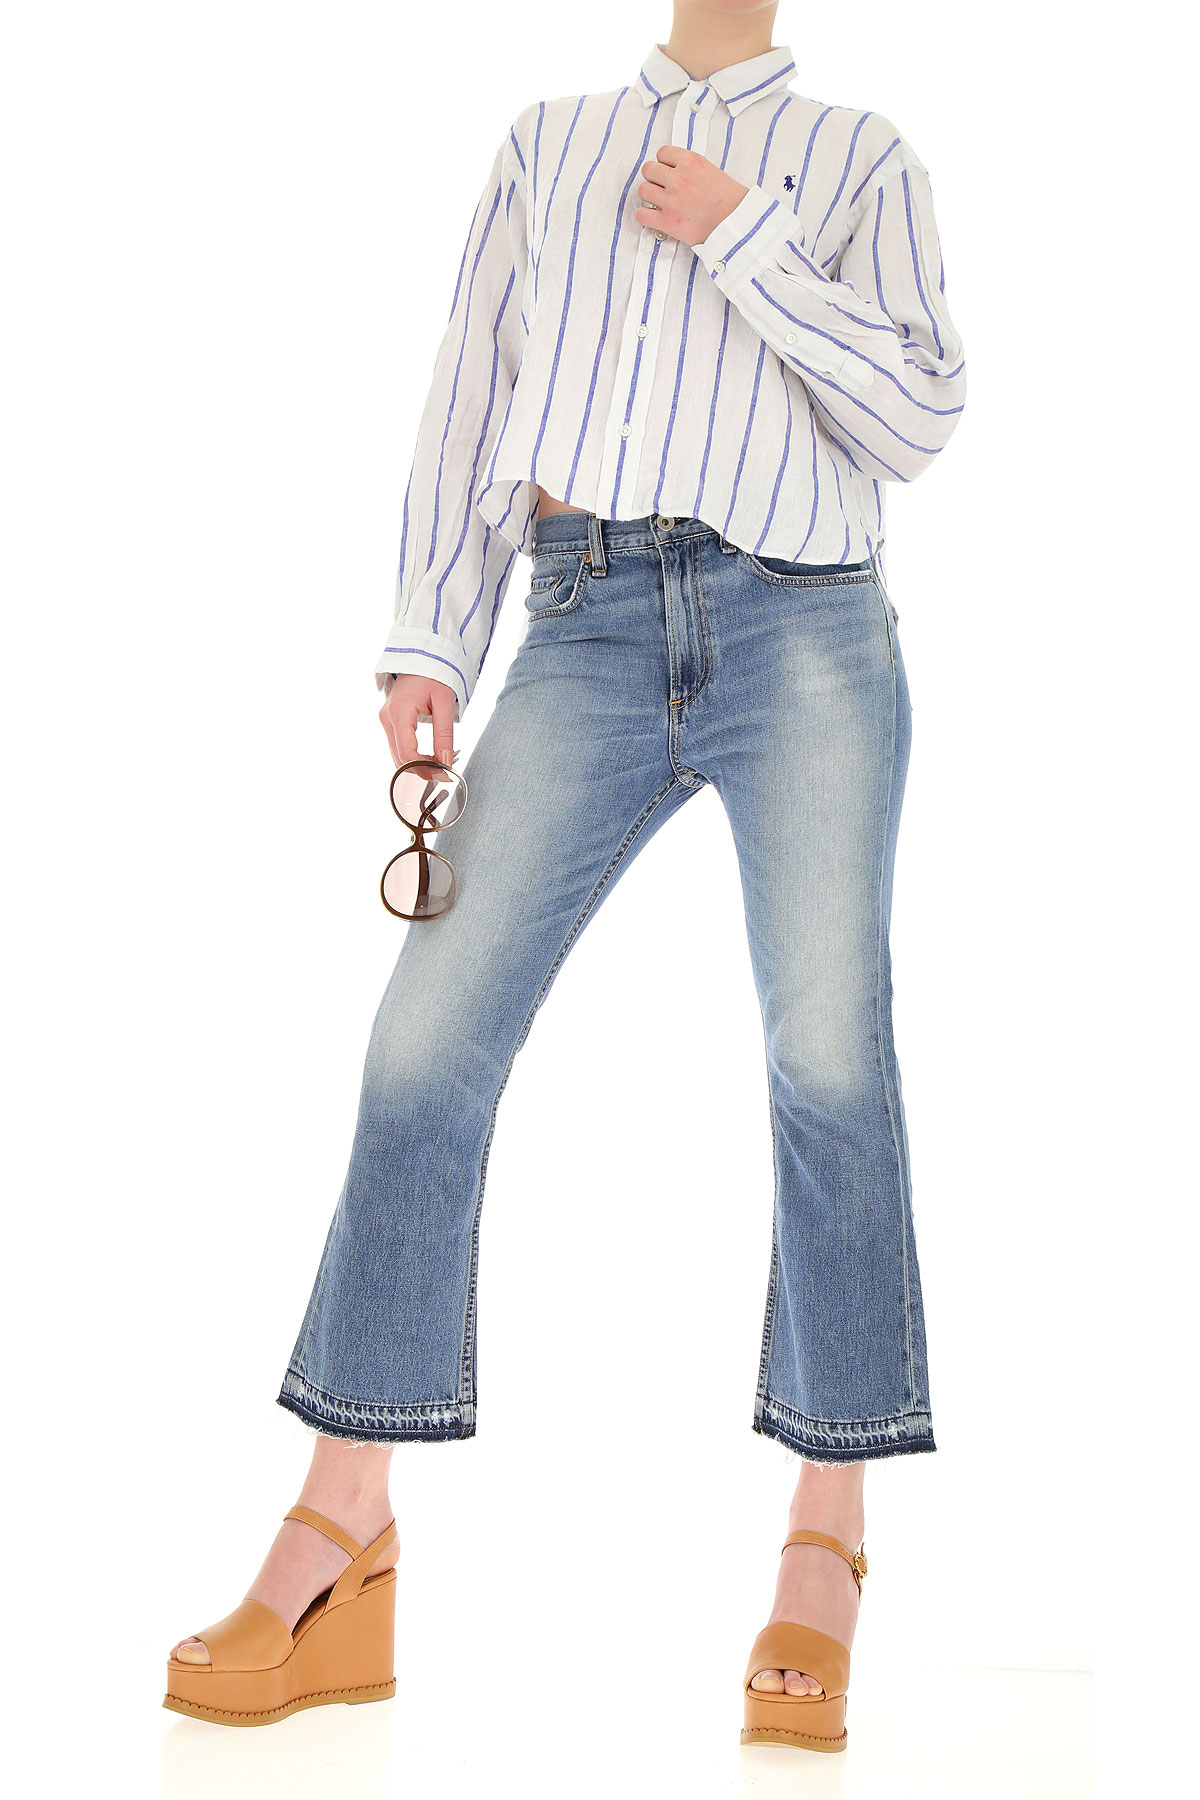 Mujer verano Ropa Ralph 2019 Blanco Primavera Real Azul Lauren Para qO7w4t